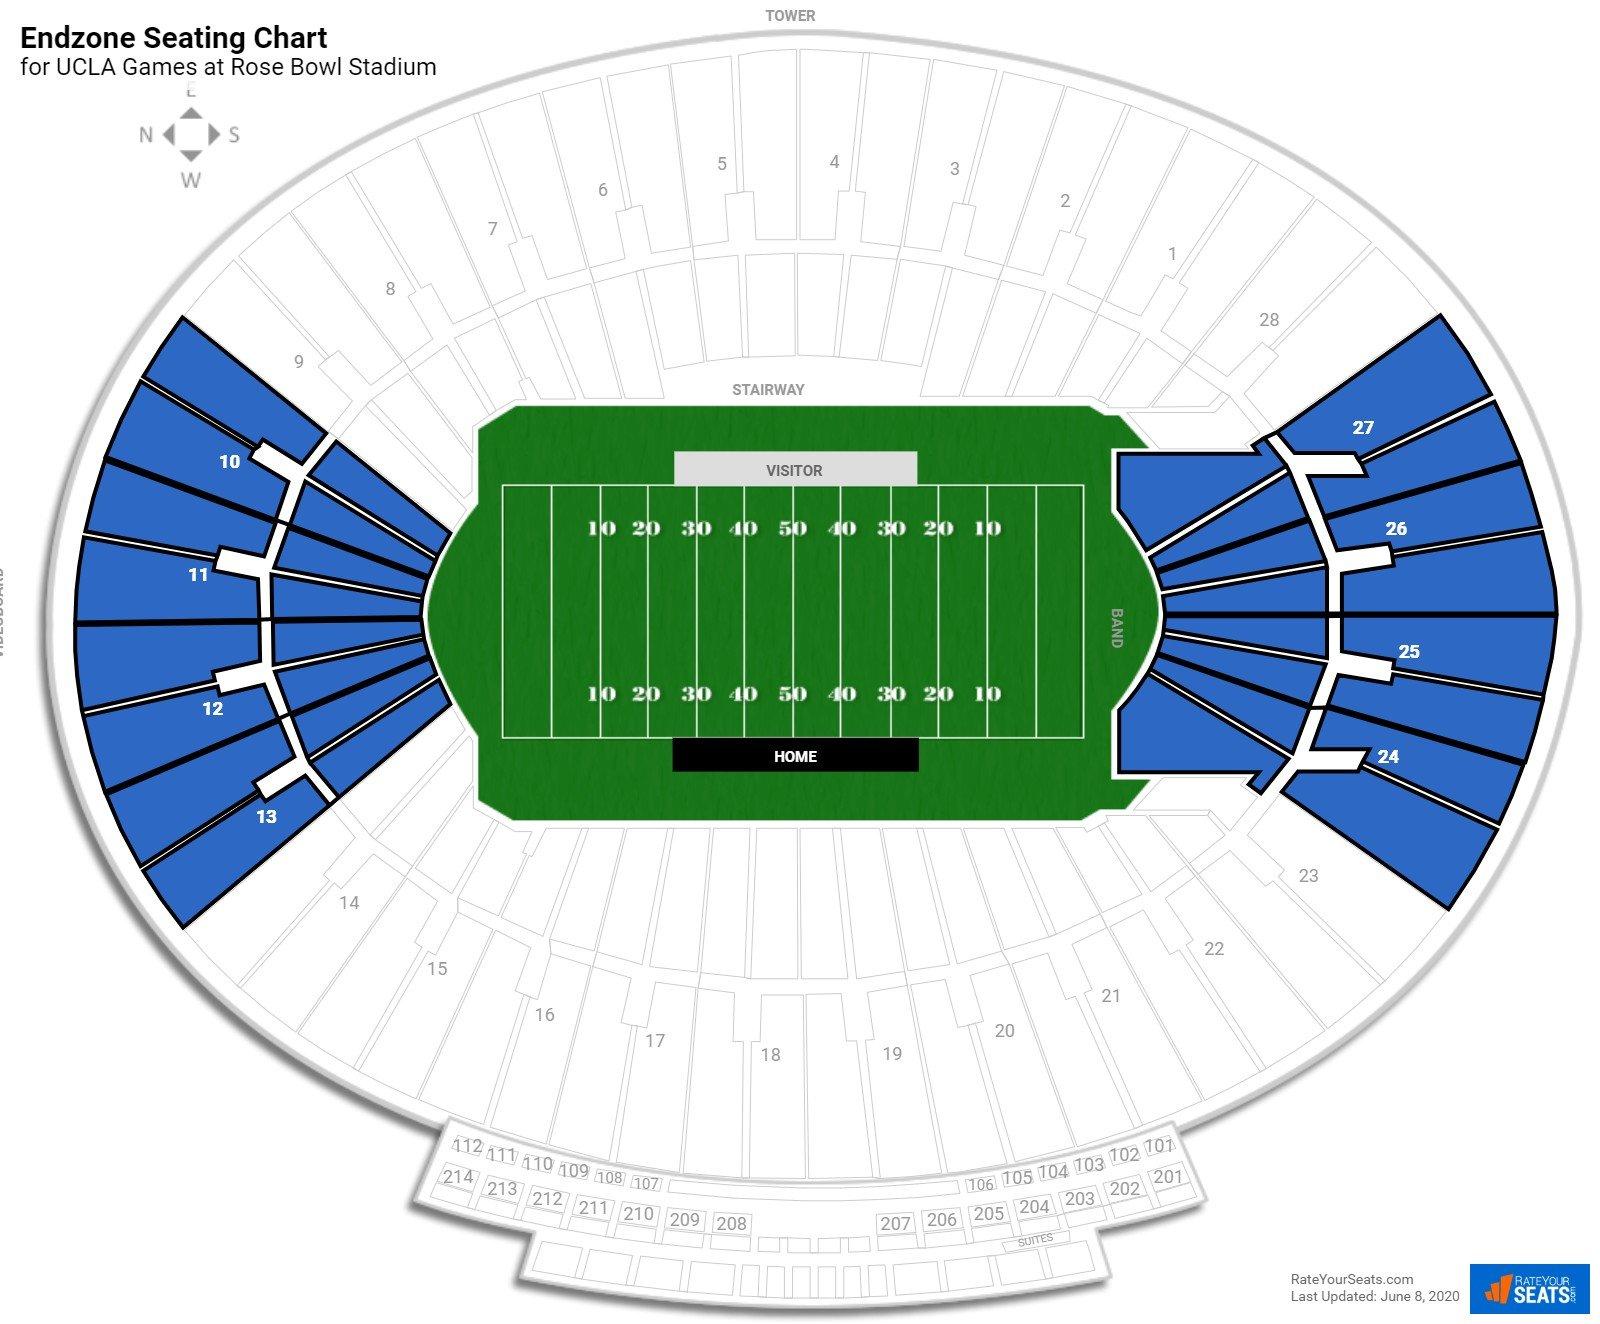 endzone rose bowl stadium football seating. Black Bedroom Furniture Sets. Home Design Ideas